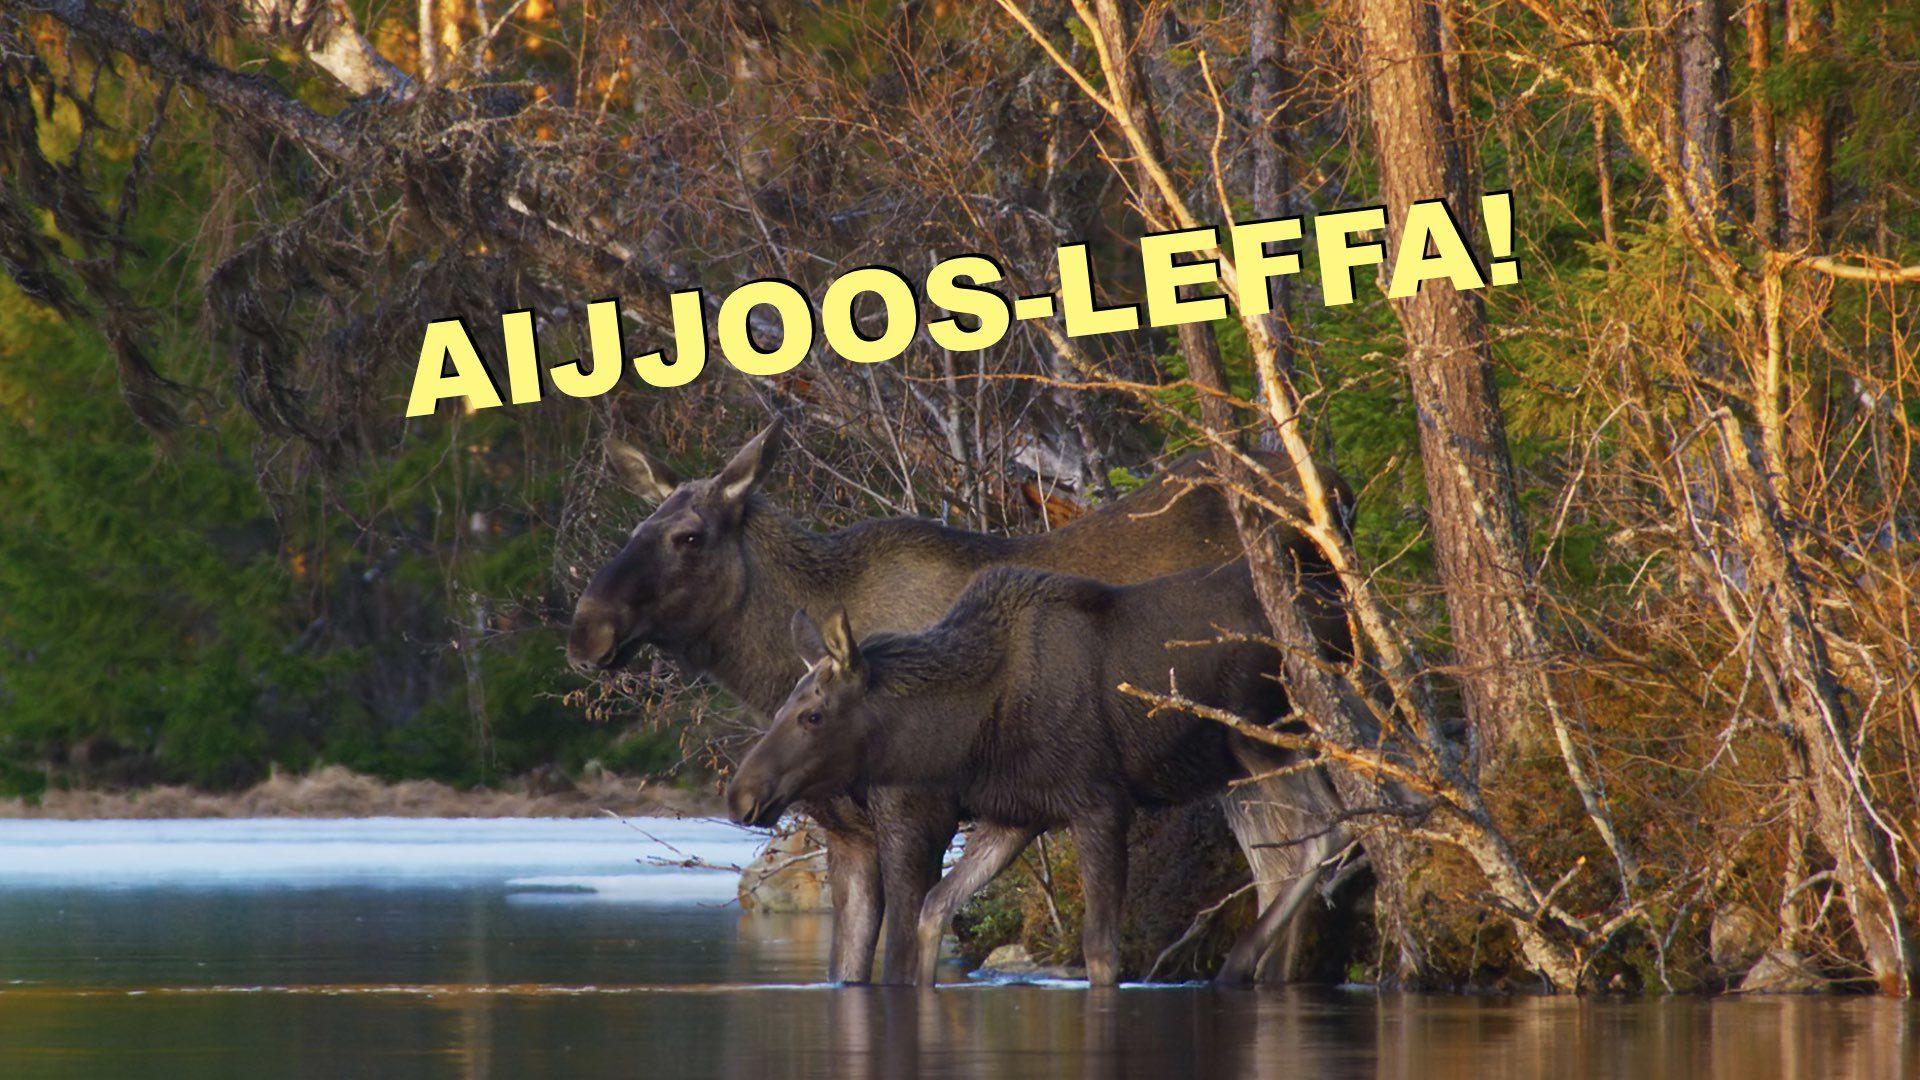 AIJJOOS-LEFFA: Luontosinfonia